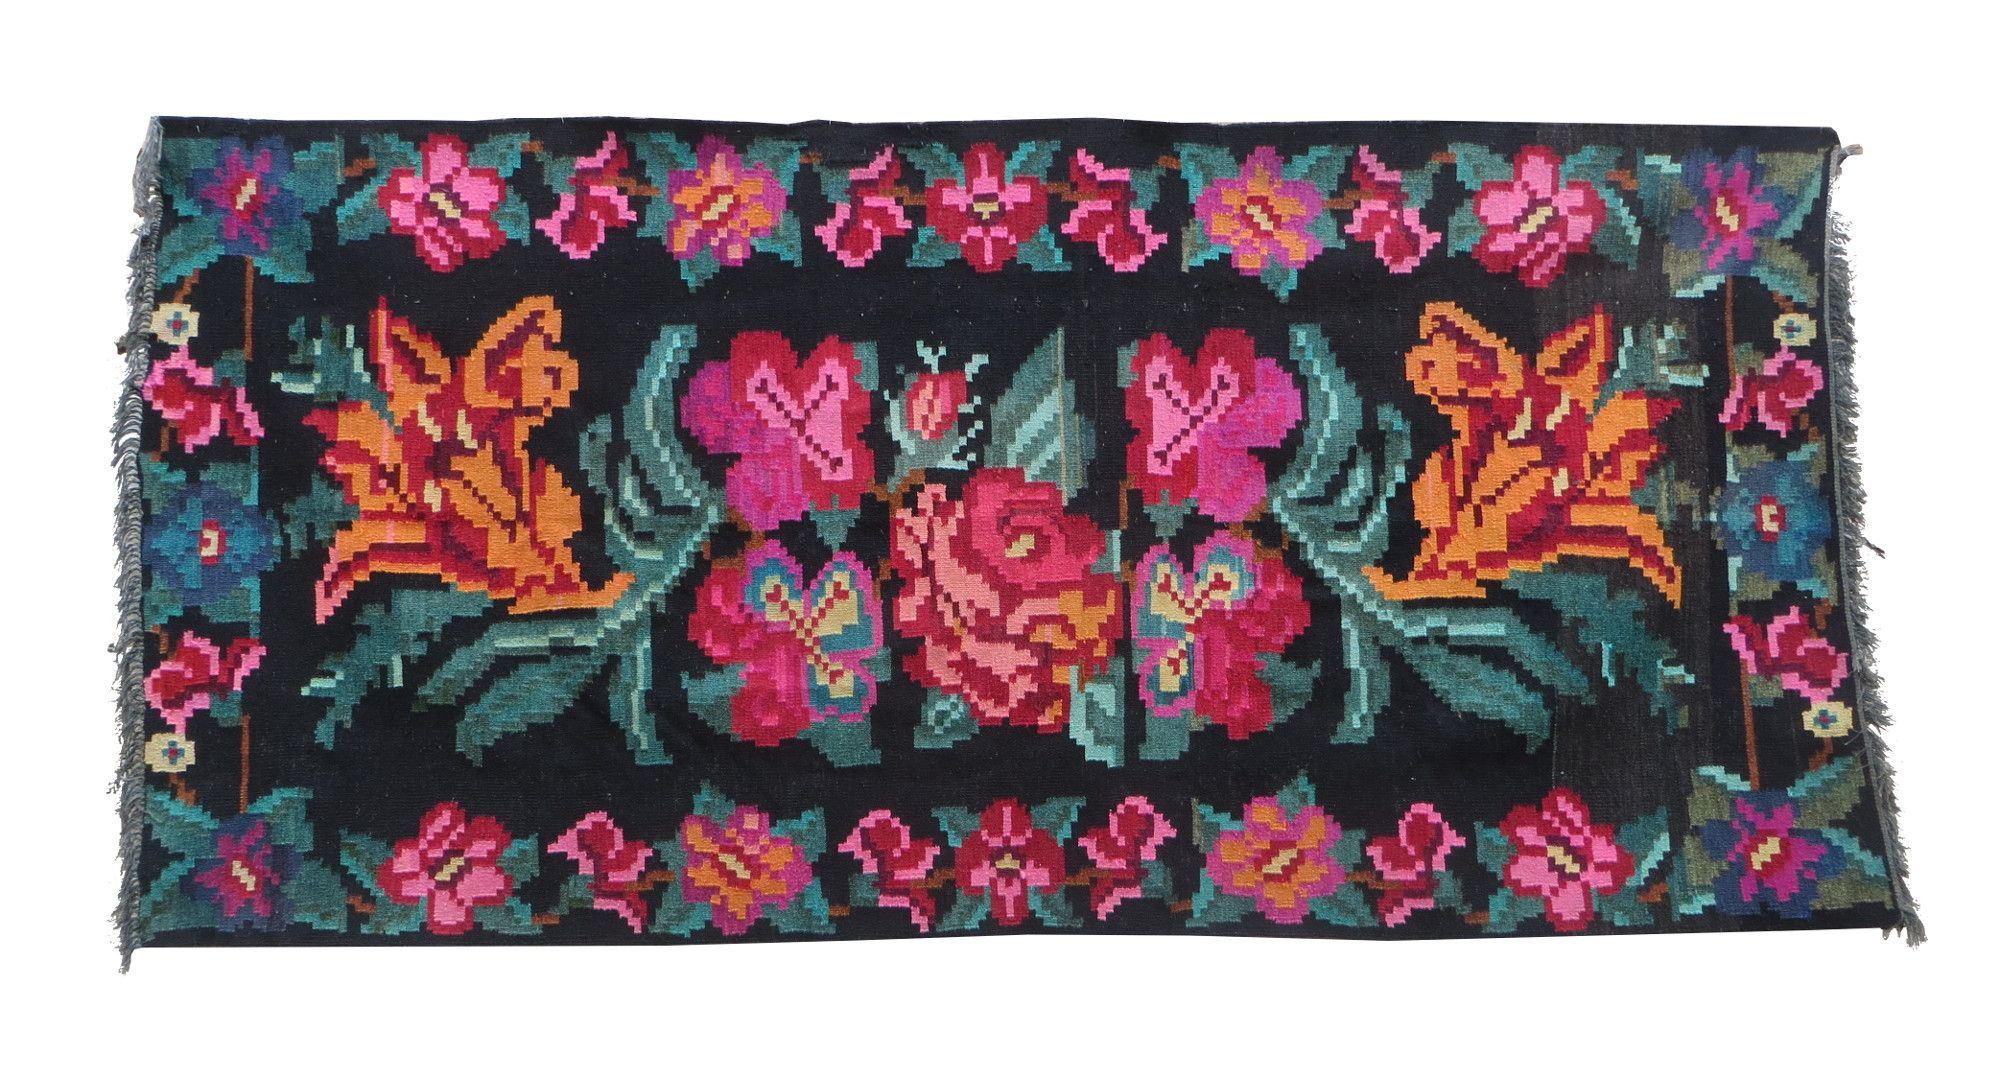 Kelim tapijt vloerkleed kopen grote vloerkleden vloerkleed wol